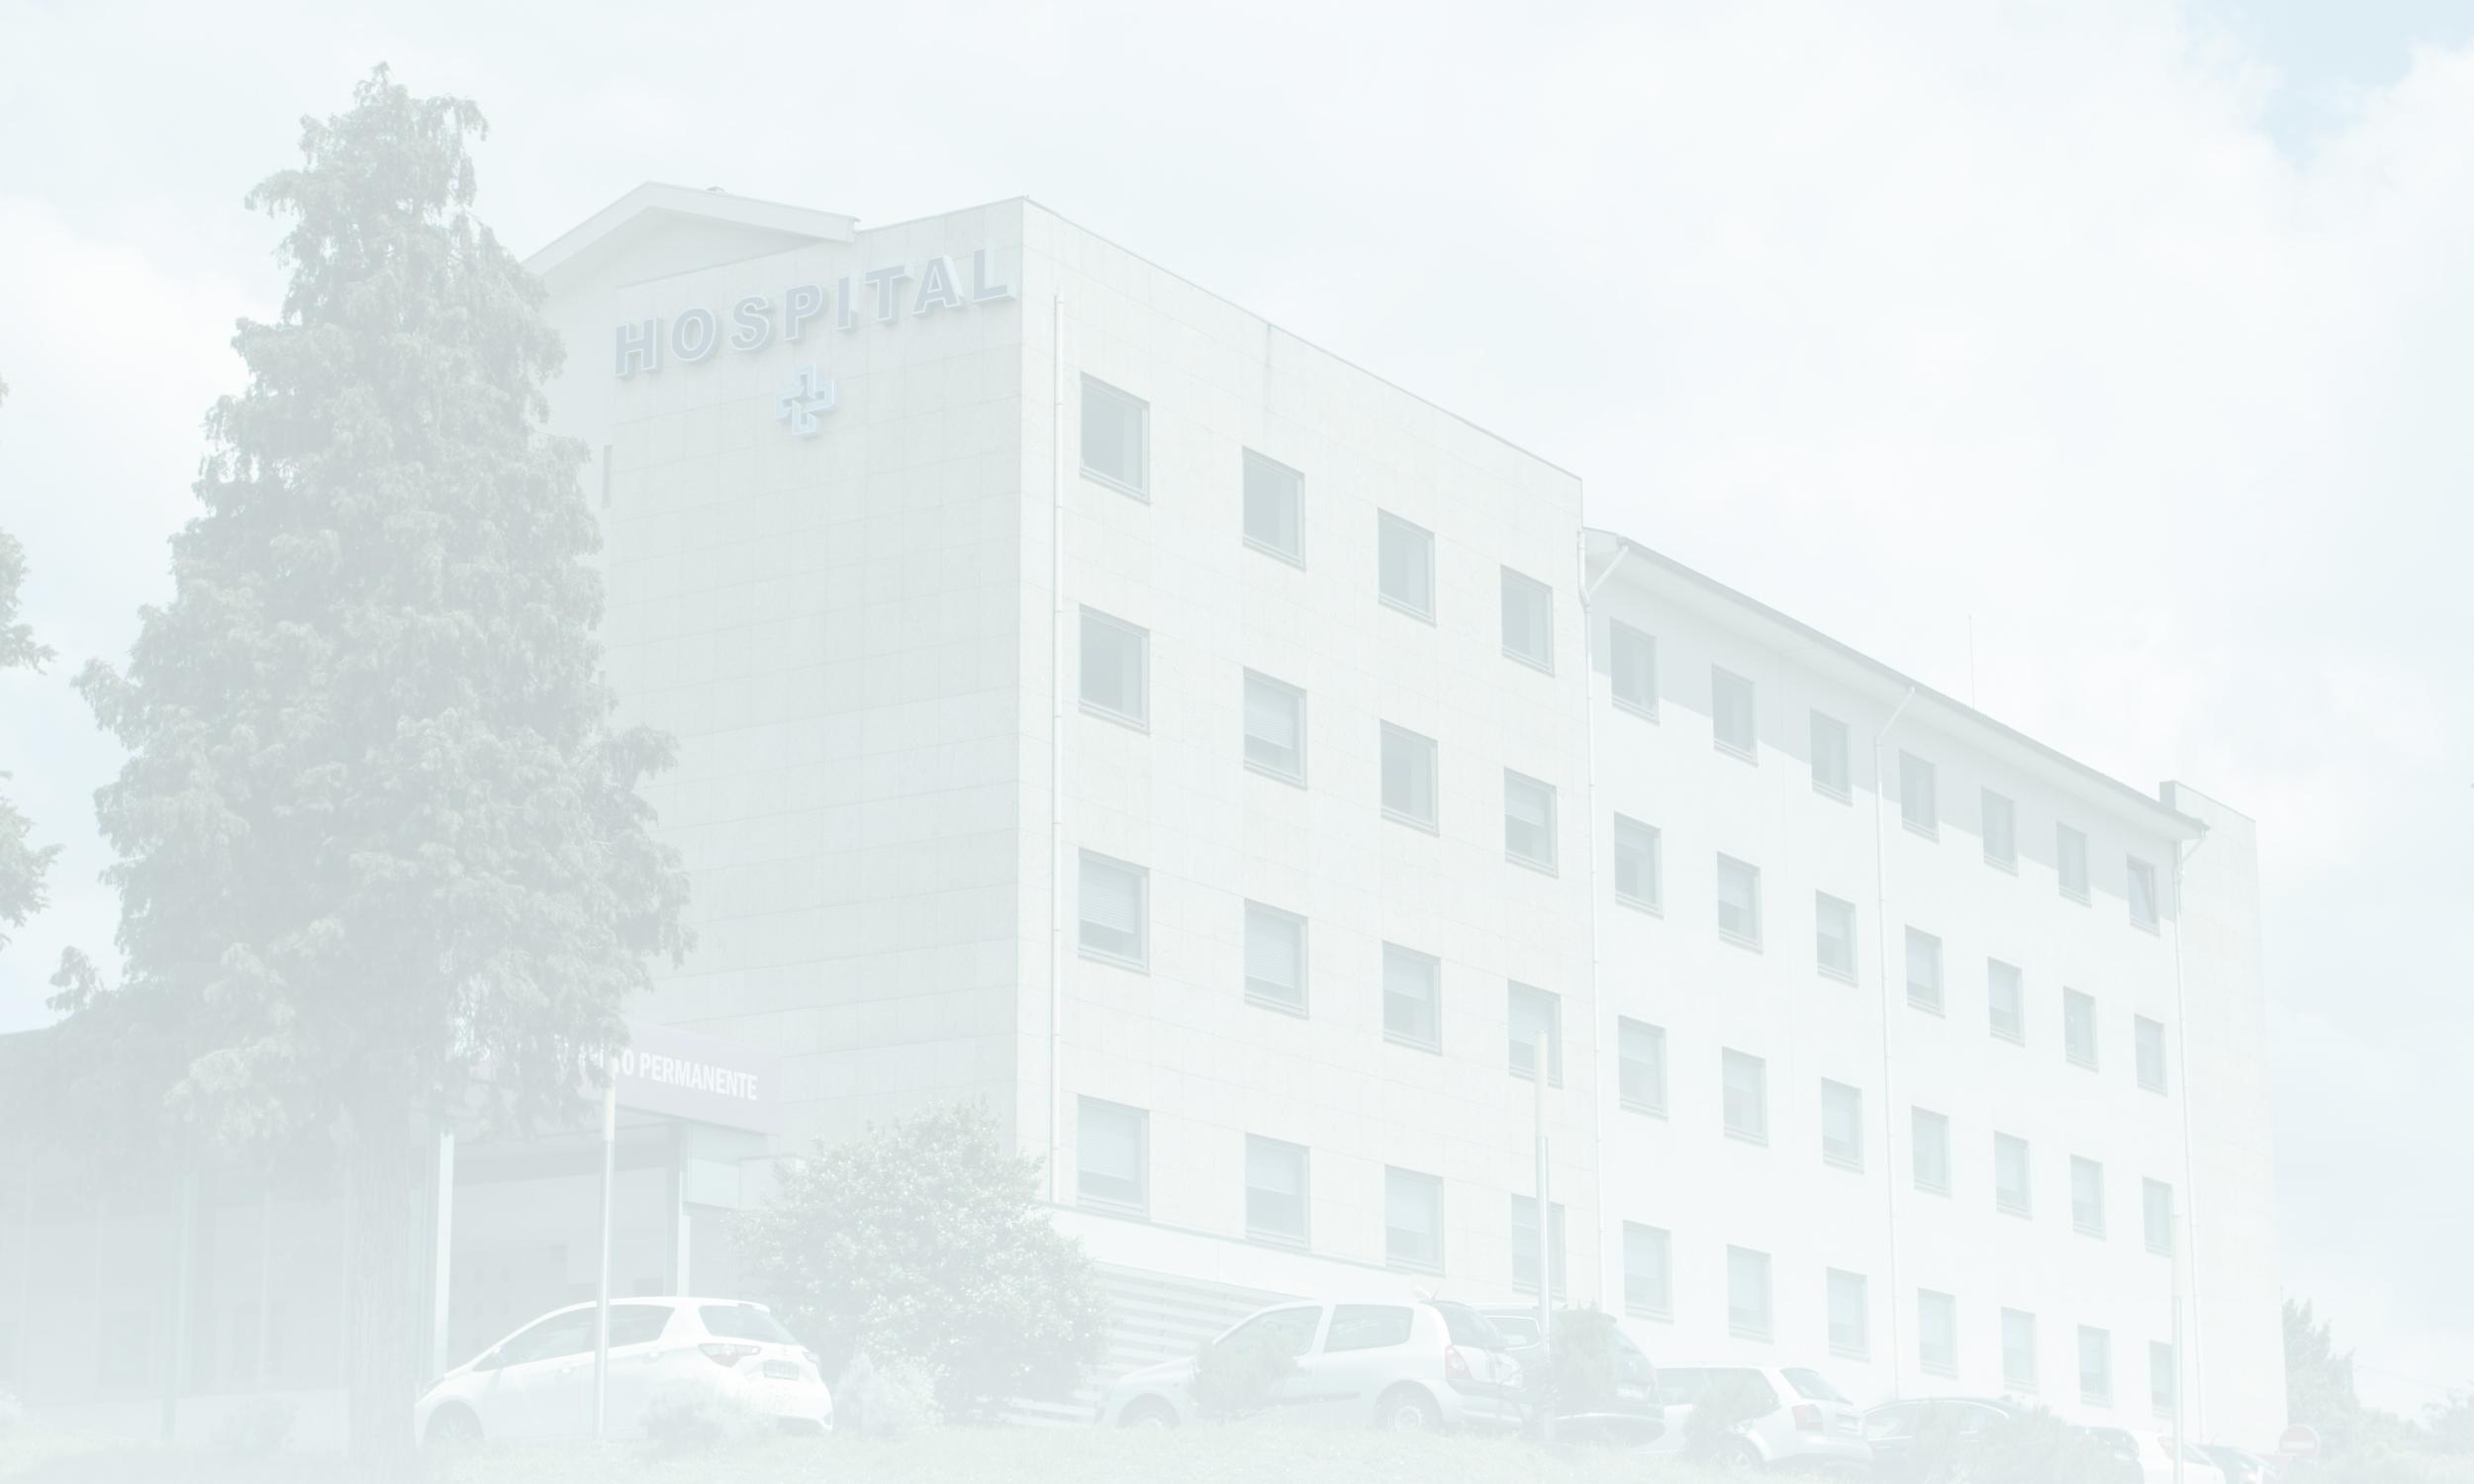 3c3d4f359c5 ATENDIMENTO PERMANENTE 24H 7 - telefone (+351) 255 780 730. Hospital  Particular de Paredes